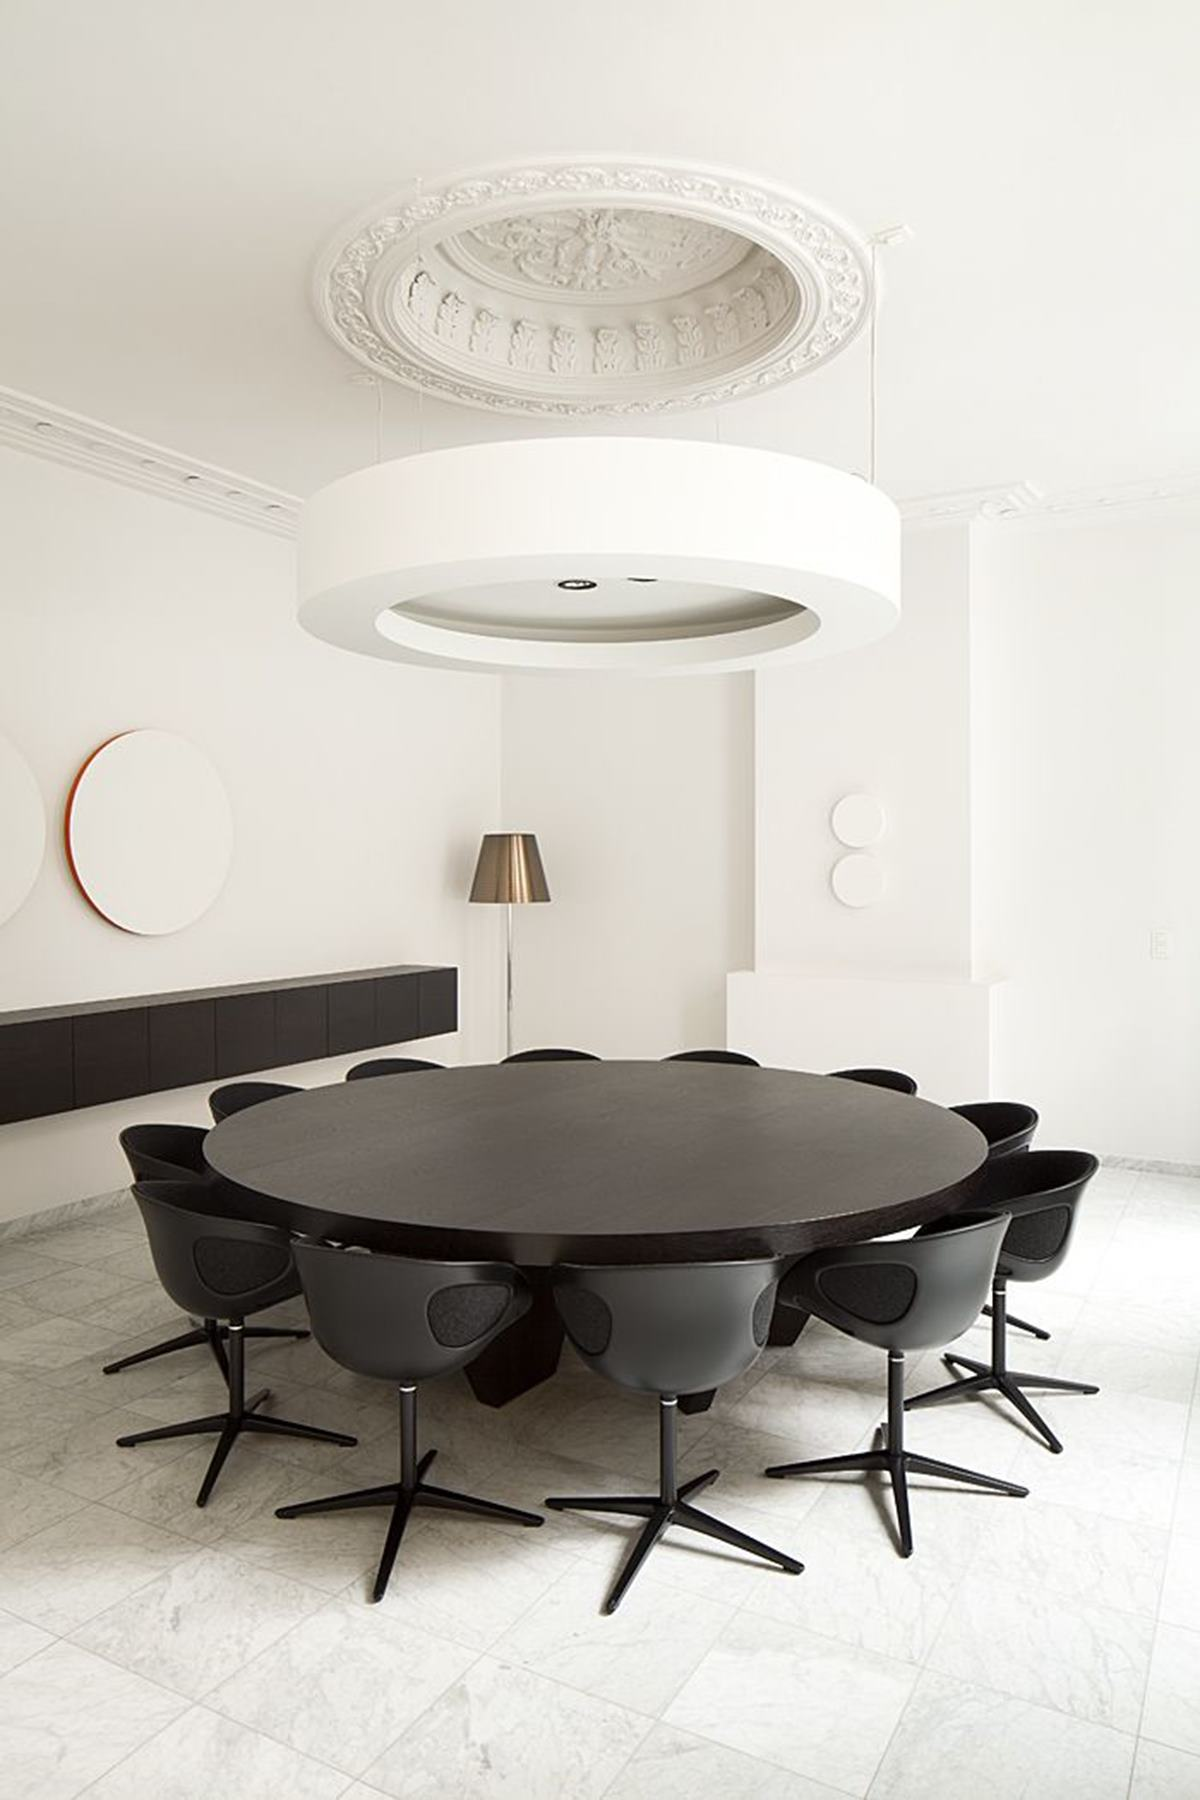 This minimalist, monochrome room